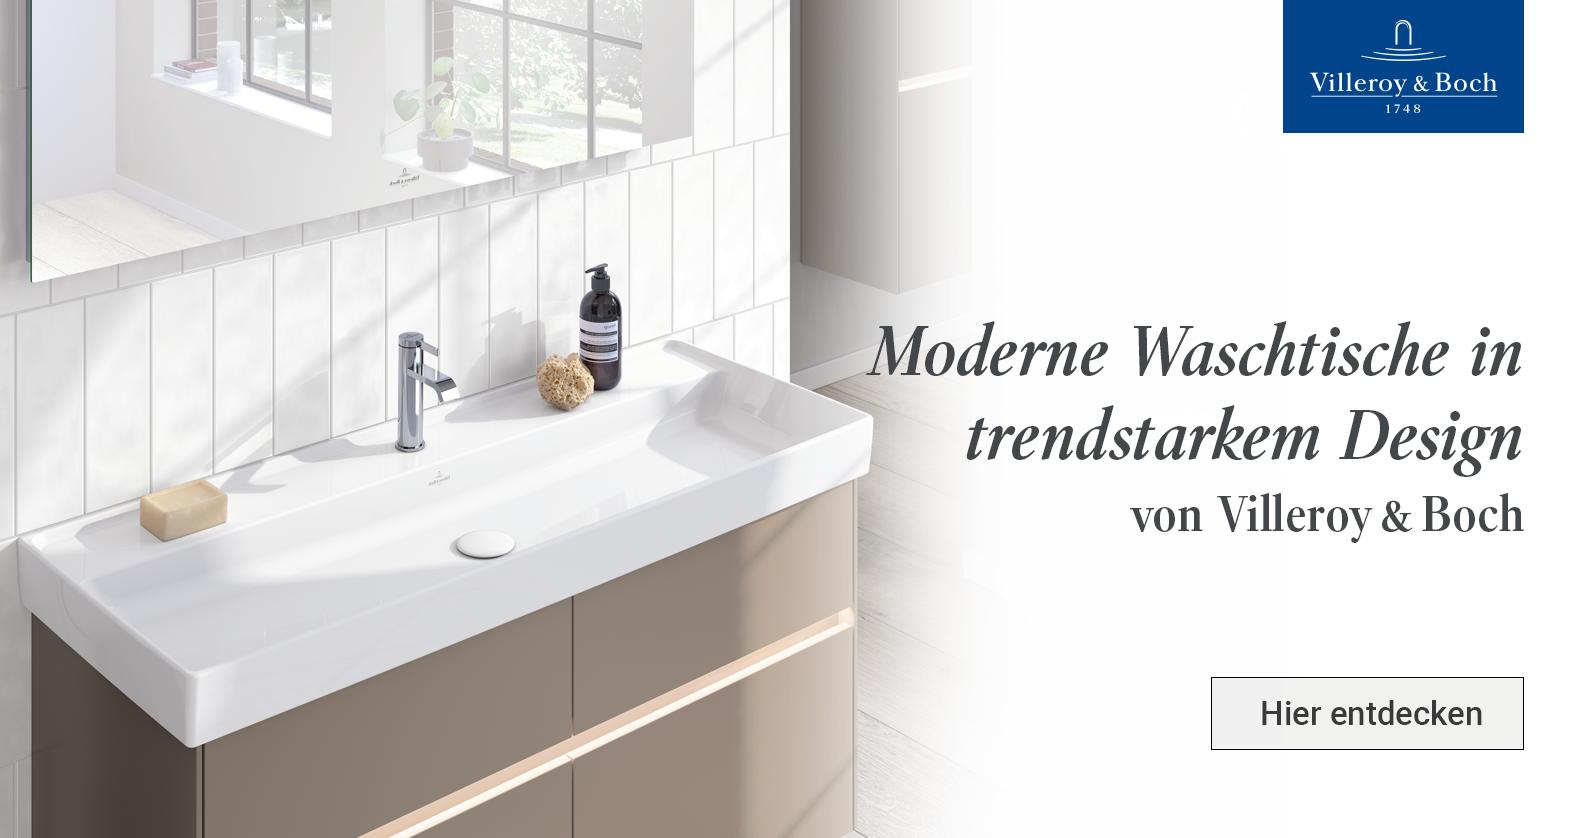 Villeroy & Boch Waschbecken bei xTWOstore